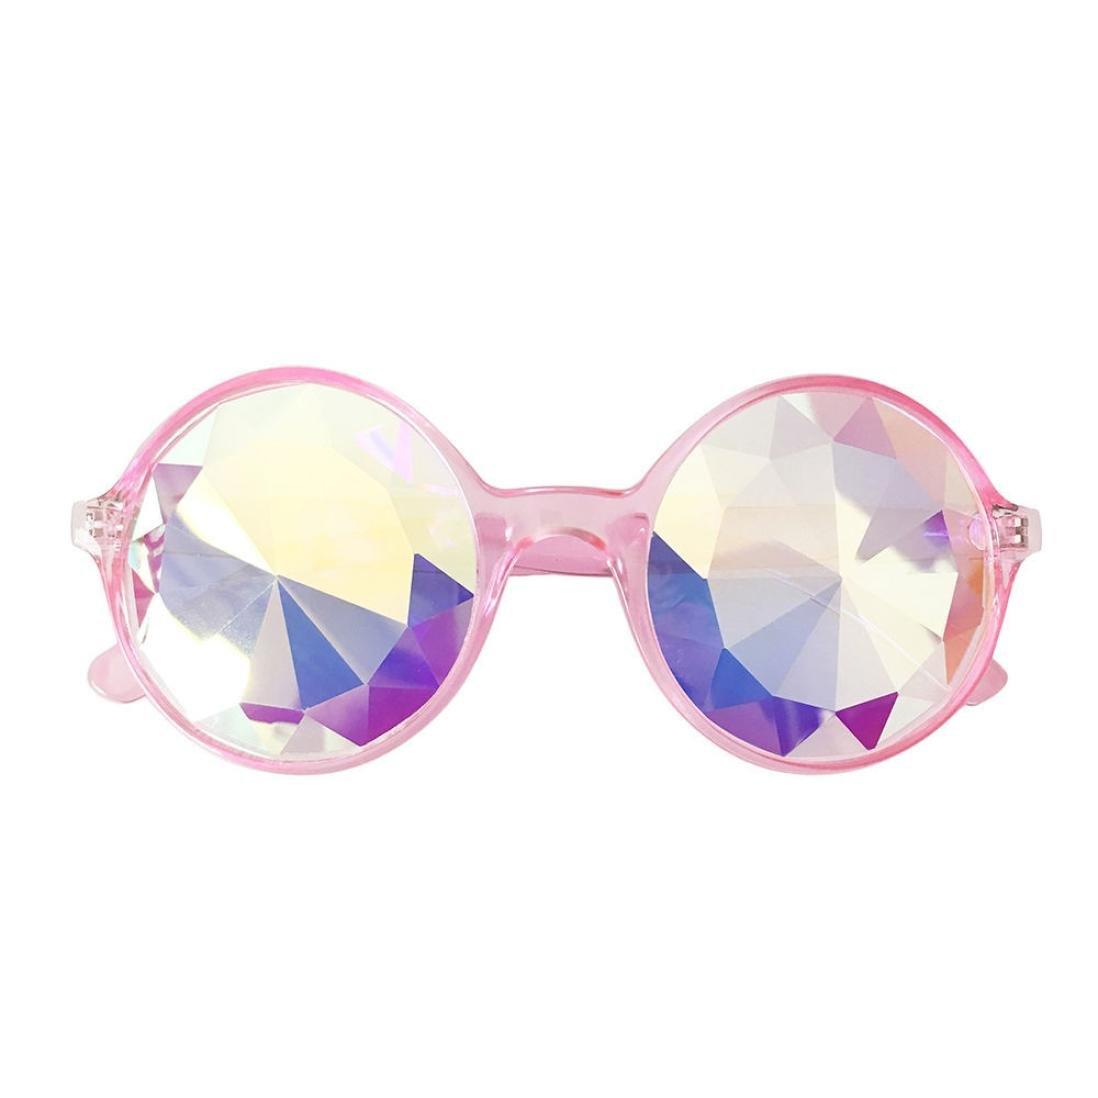 Banstore Kaleidoscope Glasses Rave Festival Party EDM Sunglasses Diffracted Lens (Pink)